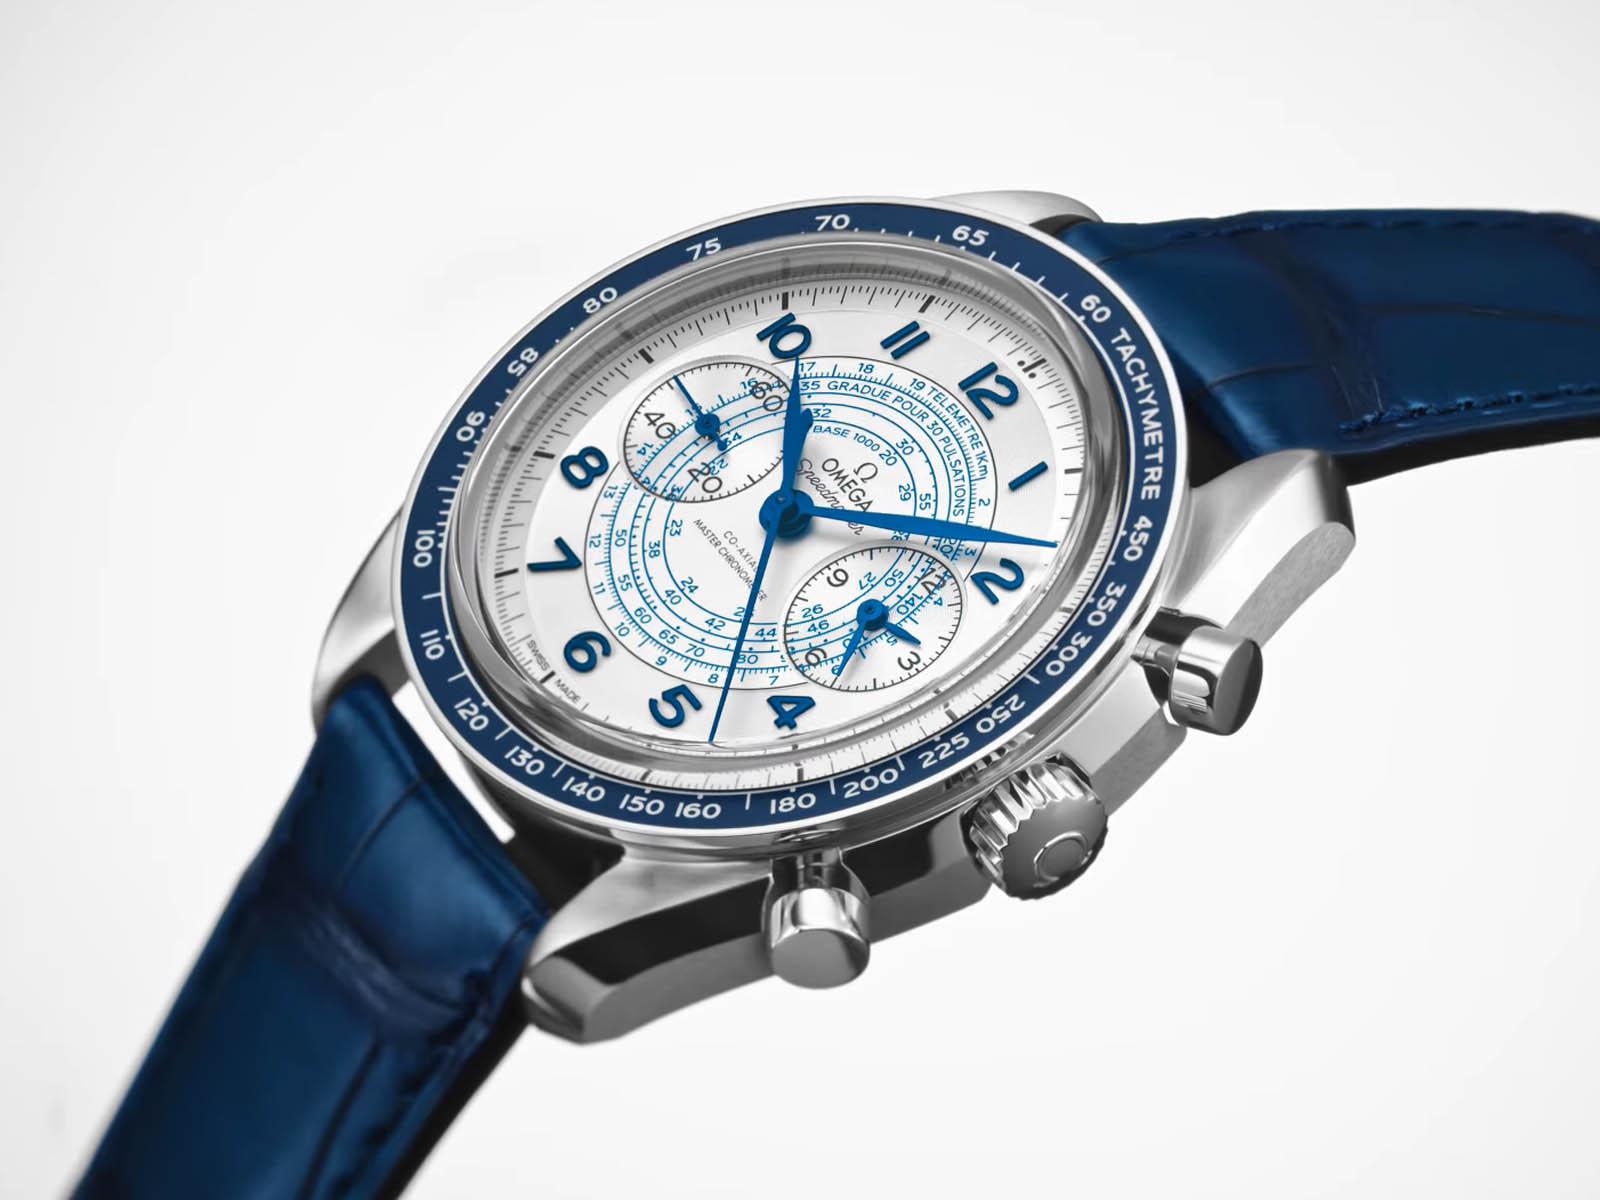 omega-speedmaster-chronoscope-co-axial-master-chronometer-chronograph-2.jpg